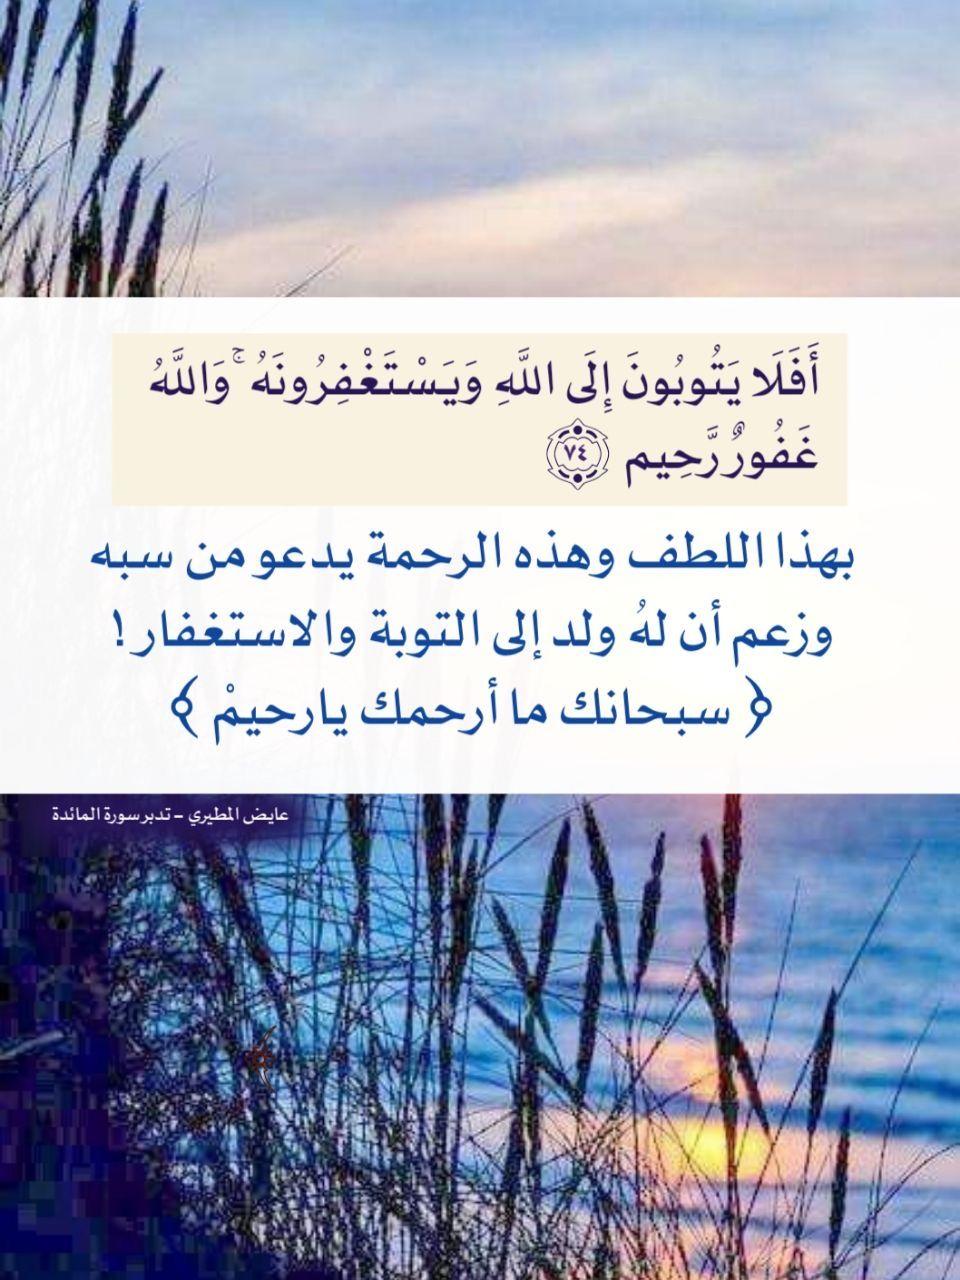 Pin By Iman Yousef On تدبرات Screenshots Arabic Quotes Desktop Screenshot